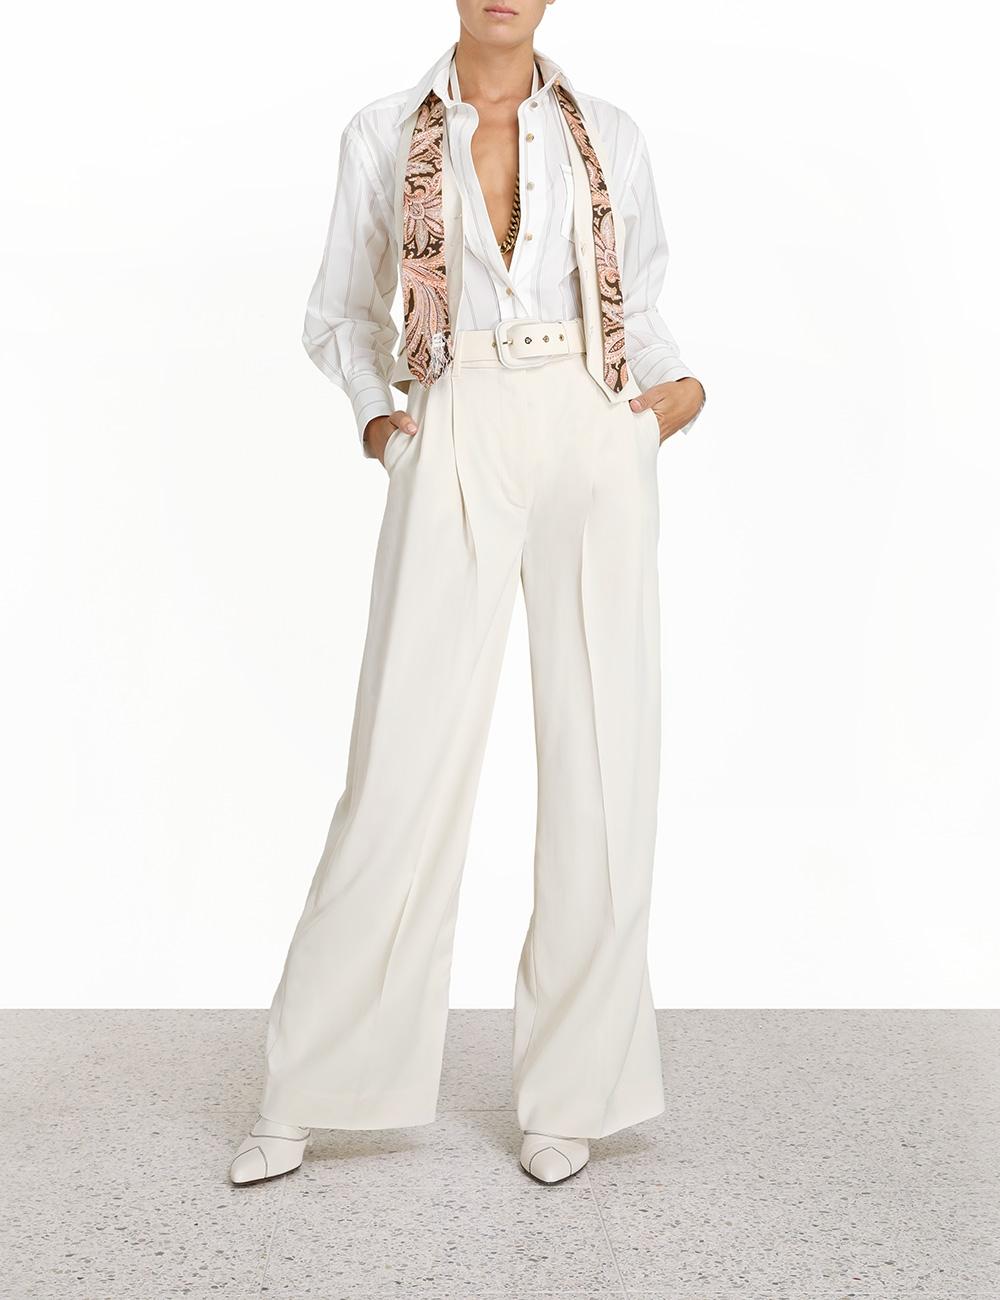 Botanica Man Style Waistcoat